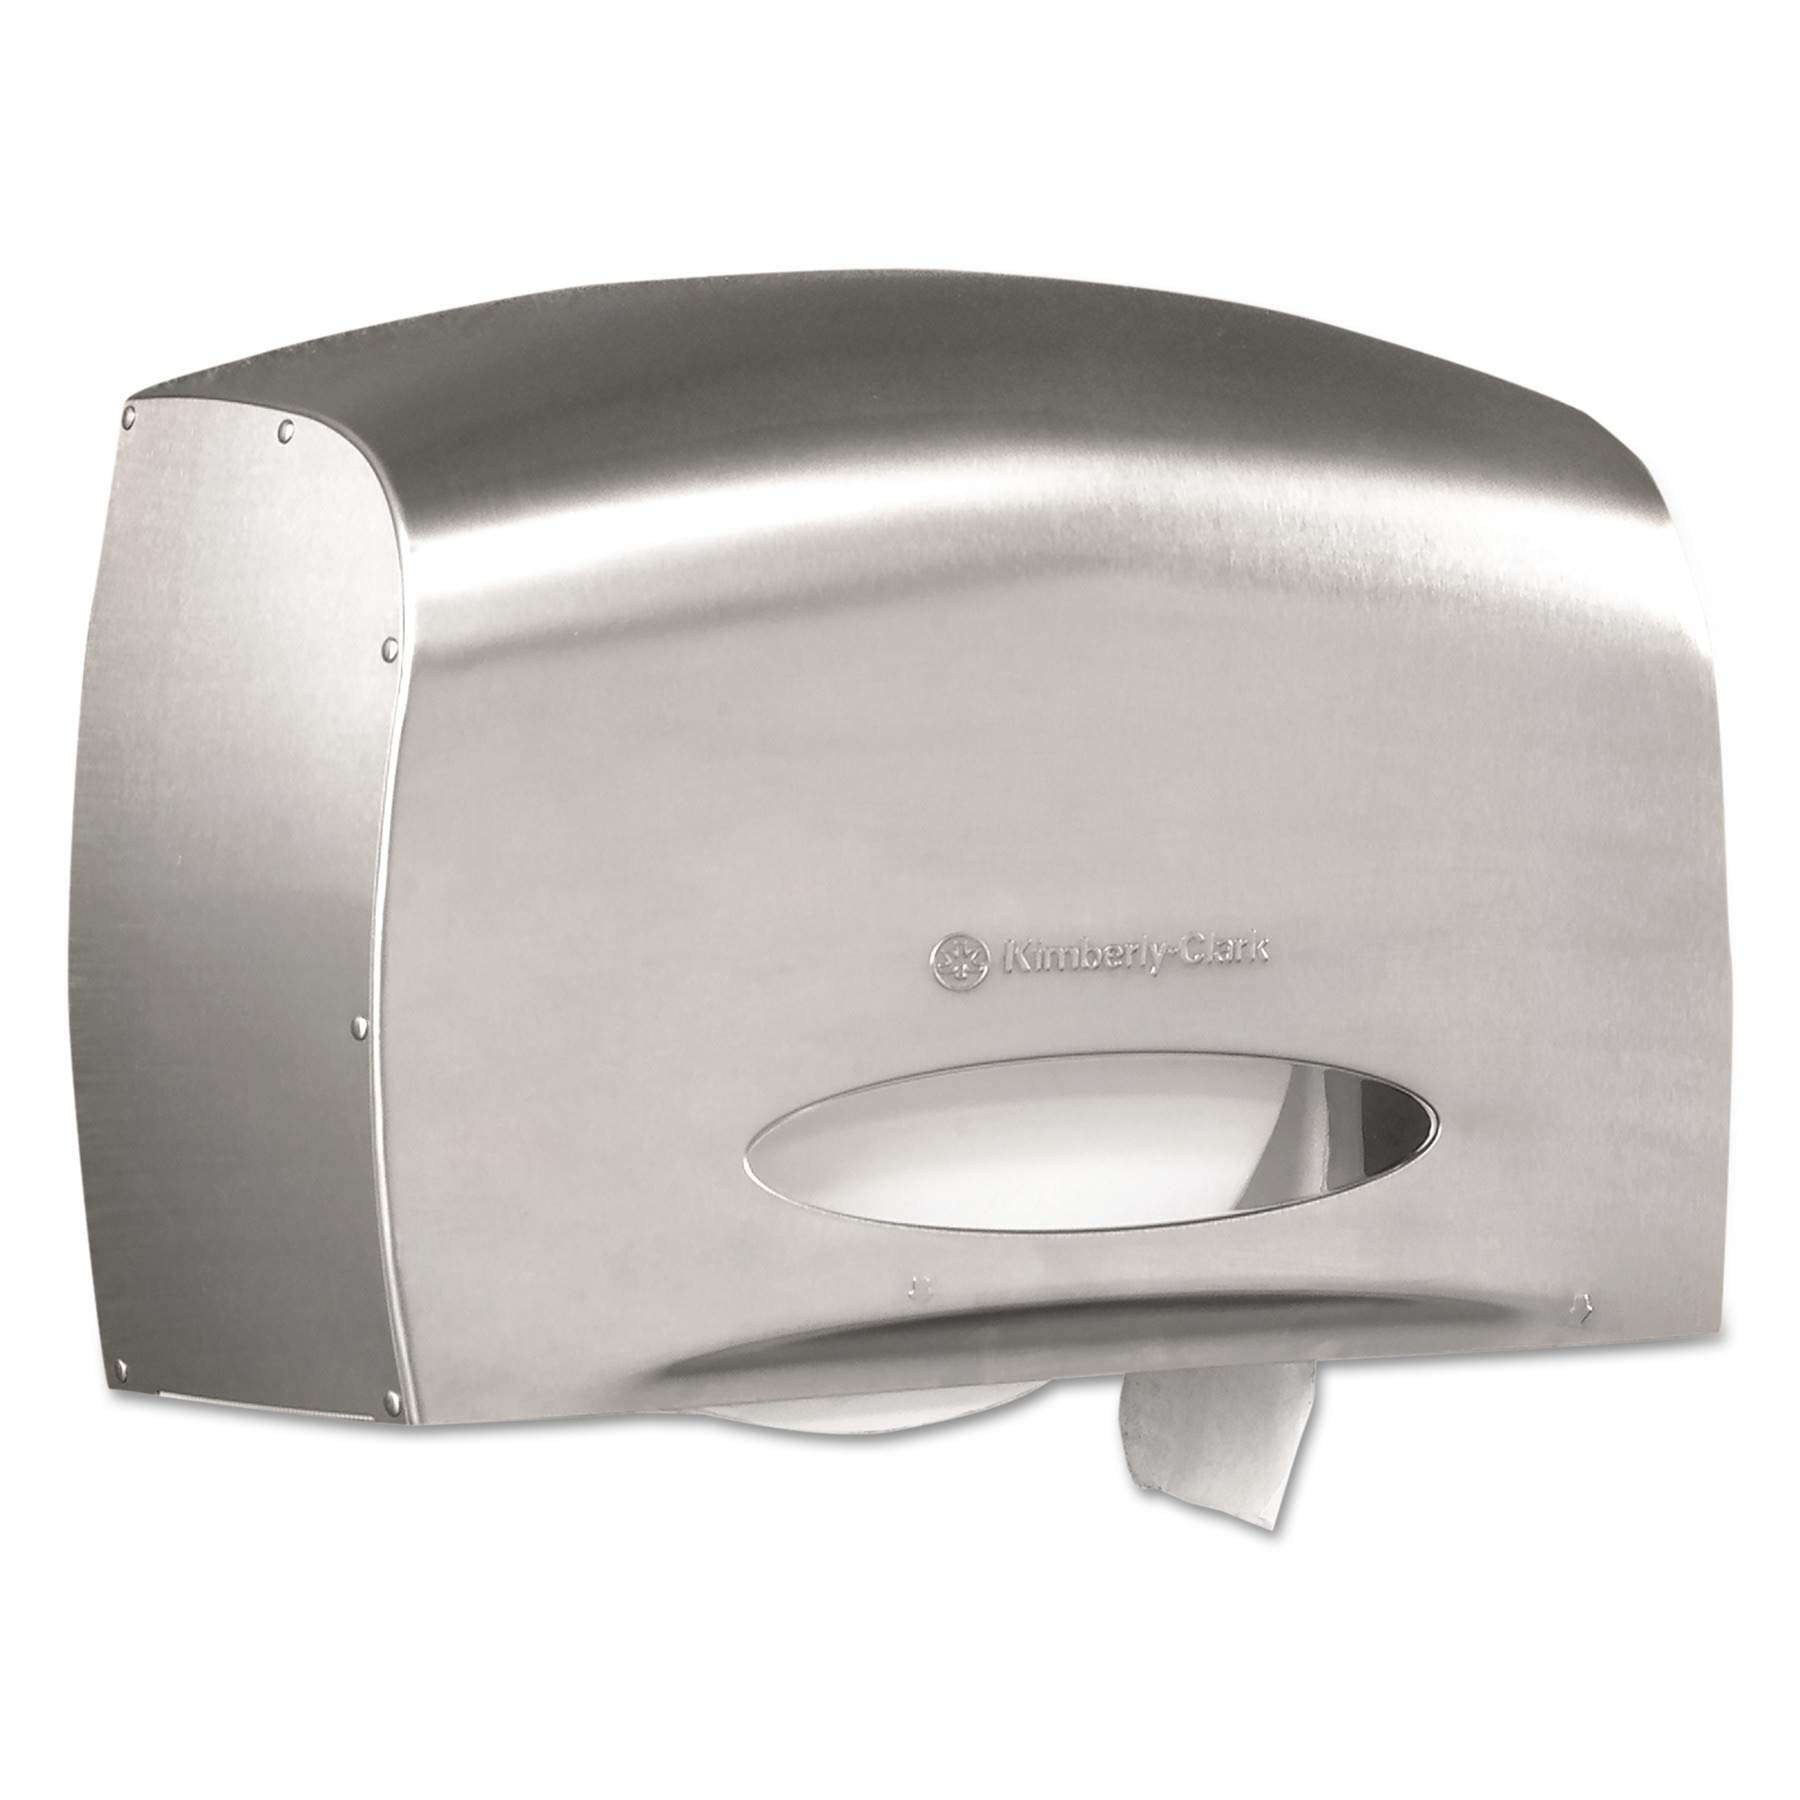 Kimberly-Clark Professional 09601 Coreless JRT Jr. Bath Tissue Dispenser, EZ Load, 6x9.8x14.3, Stainless Steel